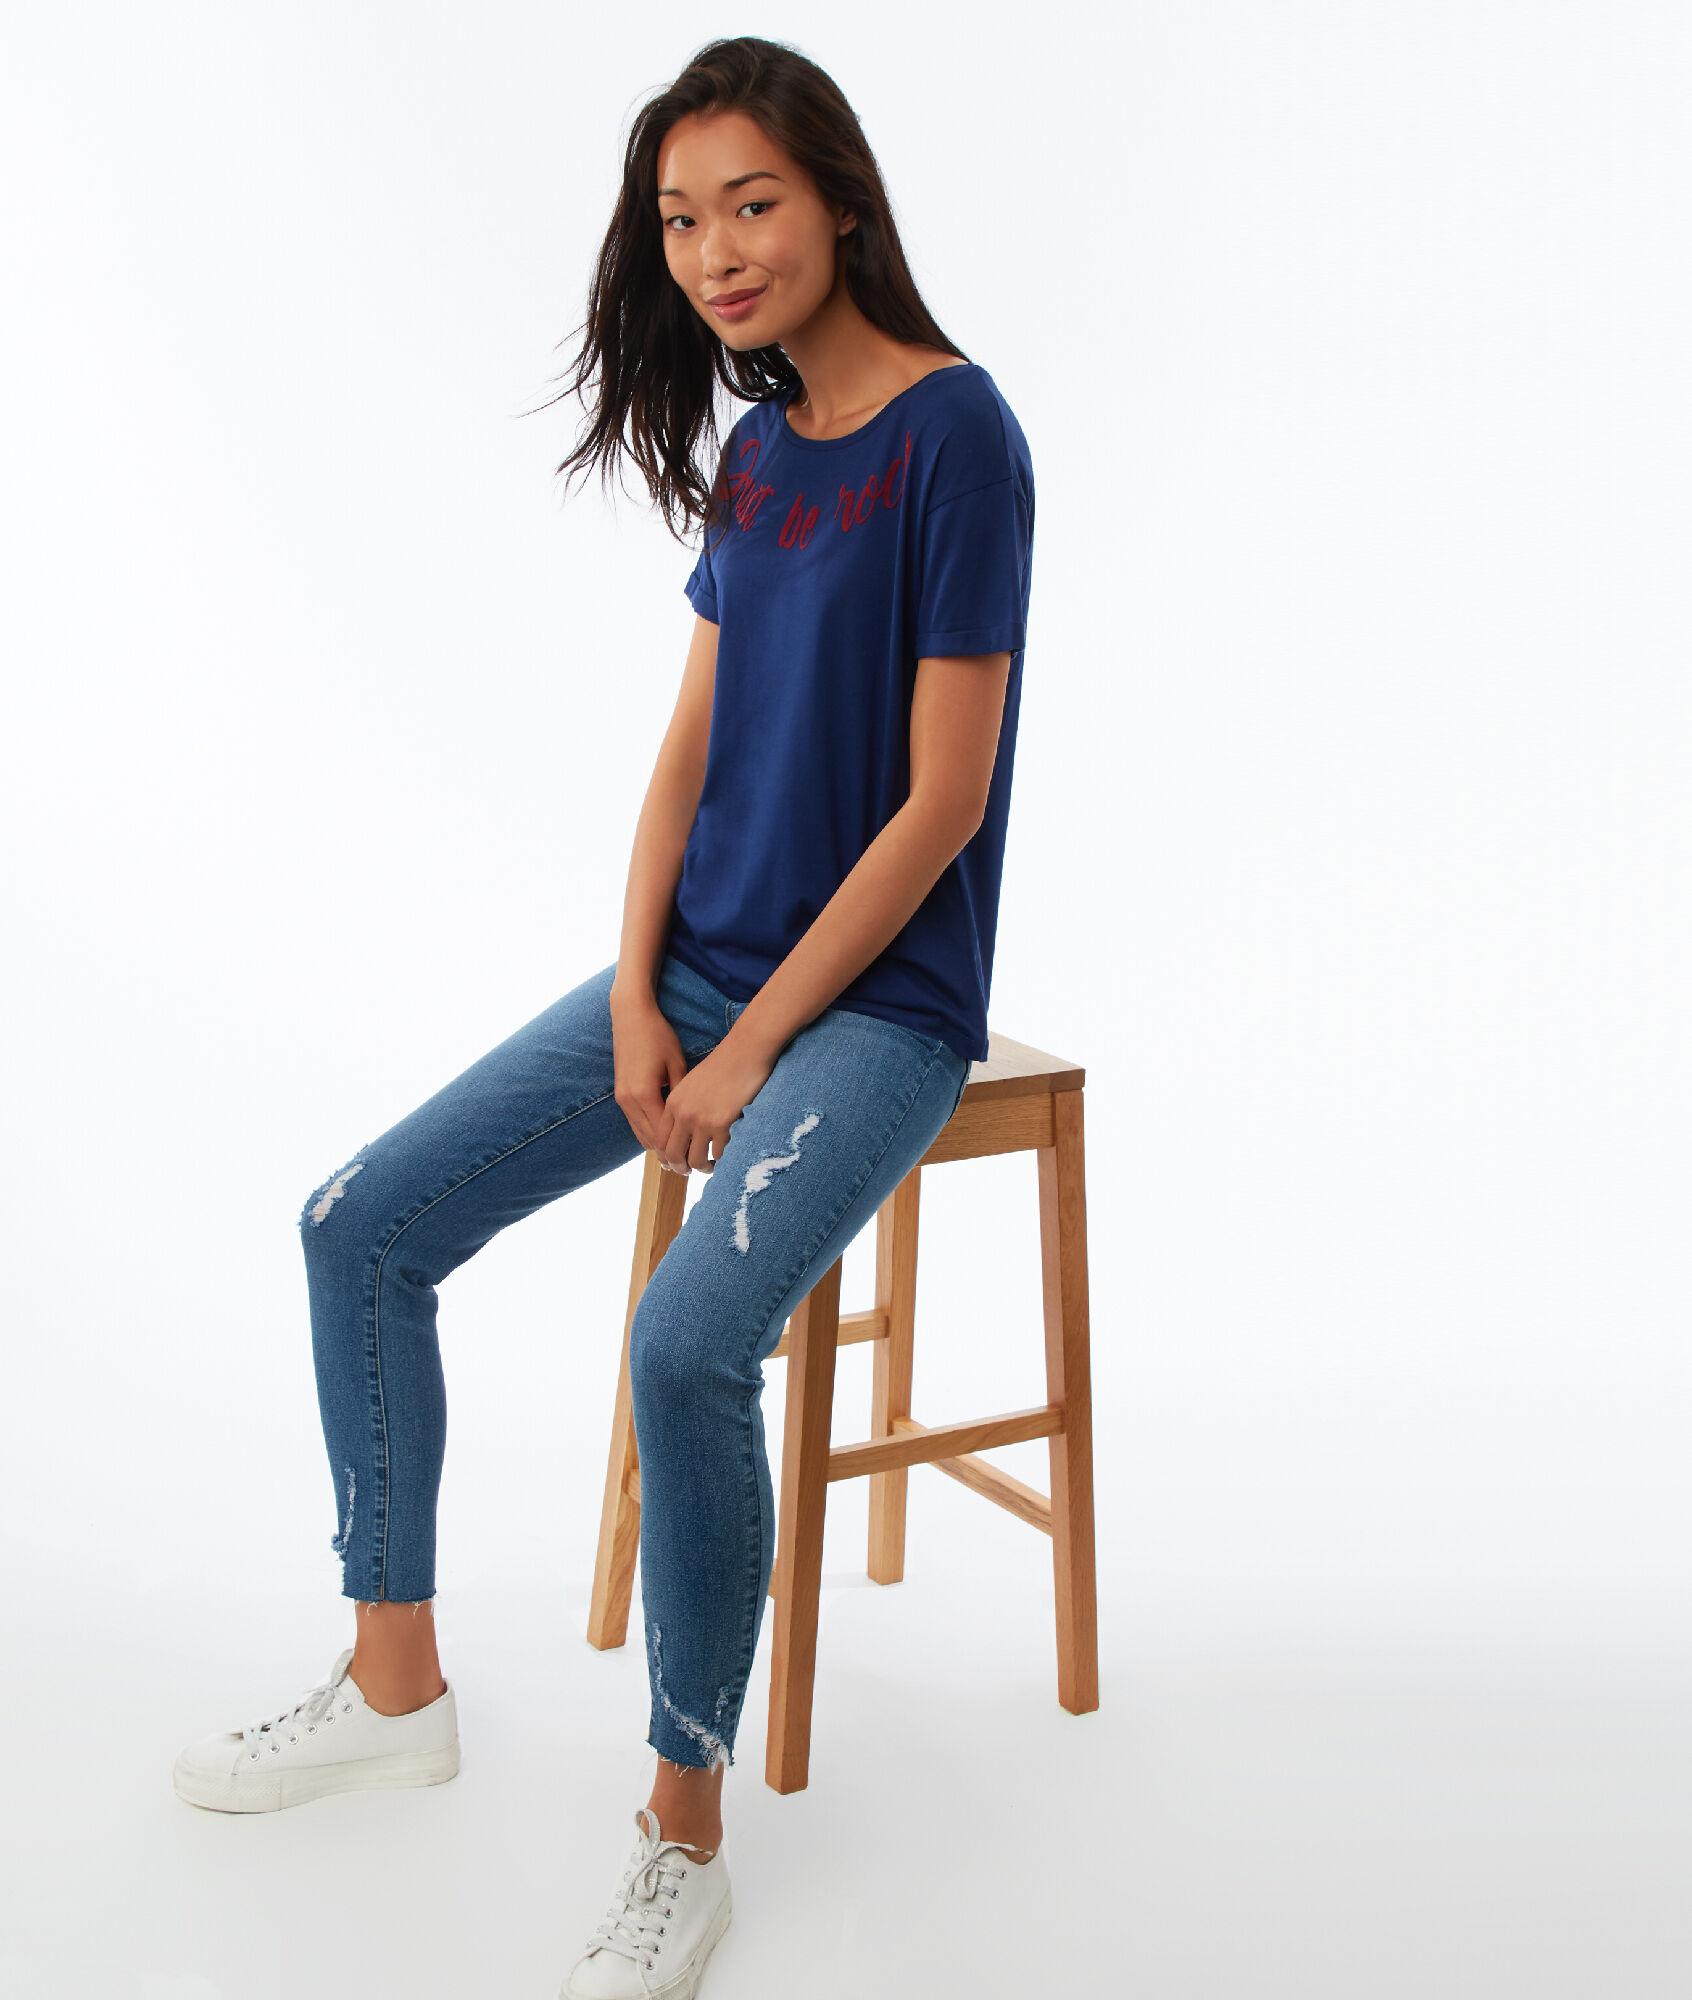 T-shirt à message - JUST - ULTRA MARINE - Etam 126262f64529